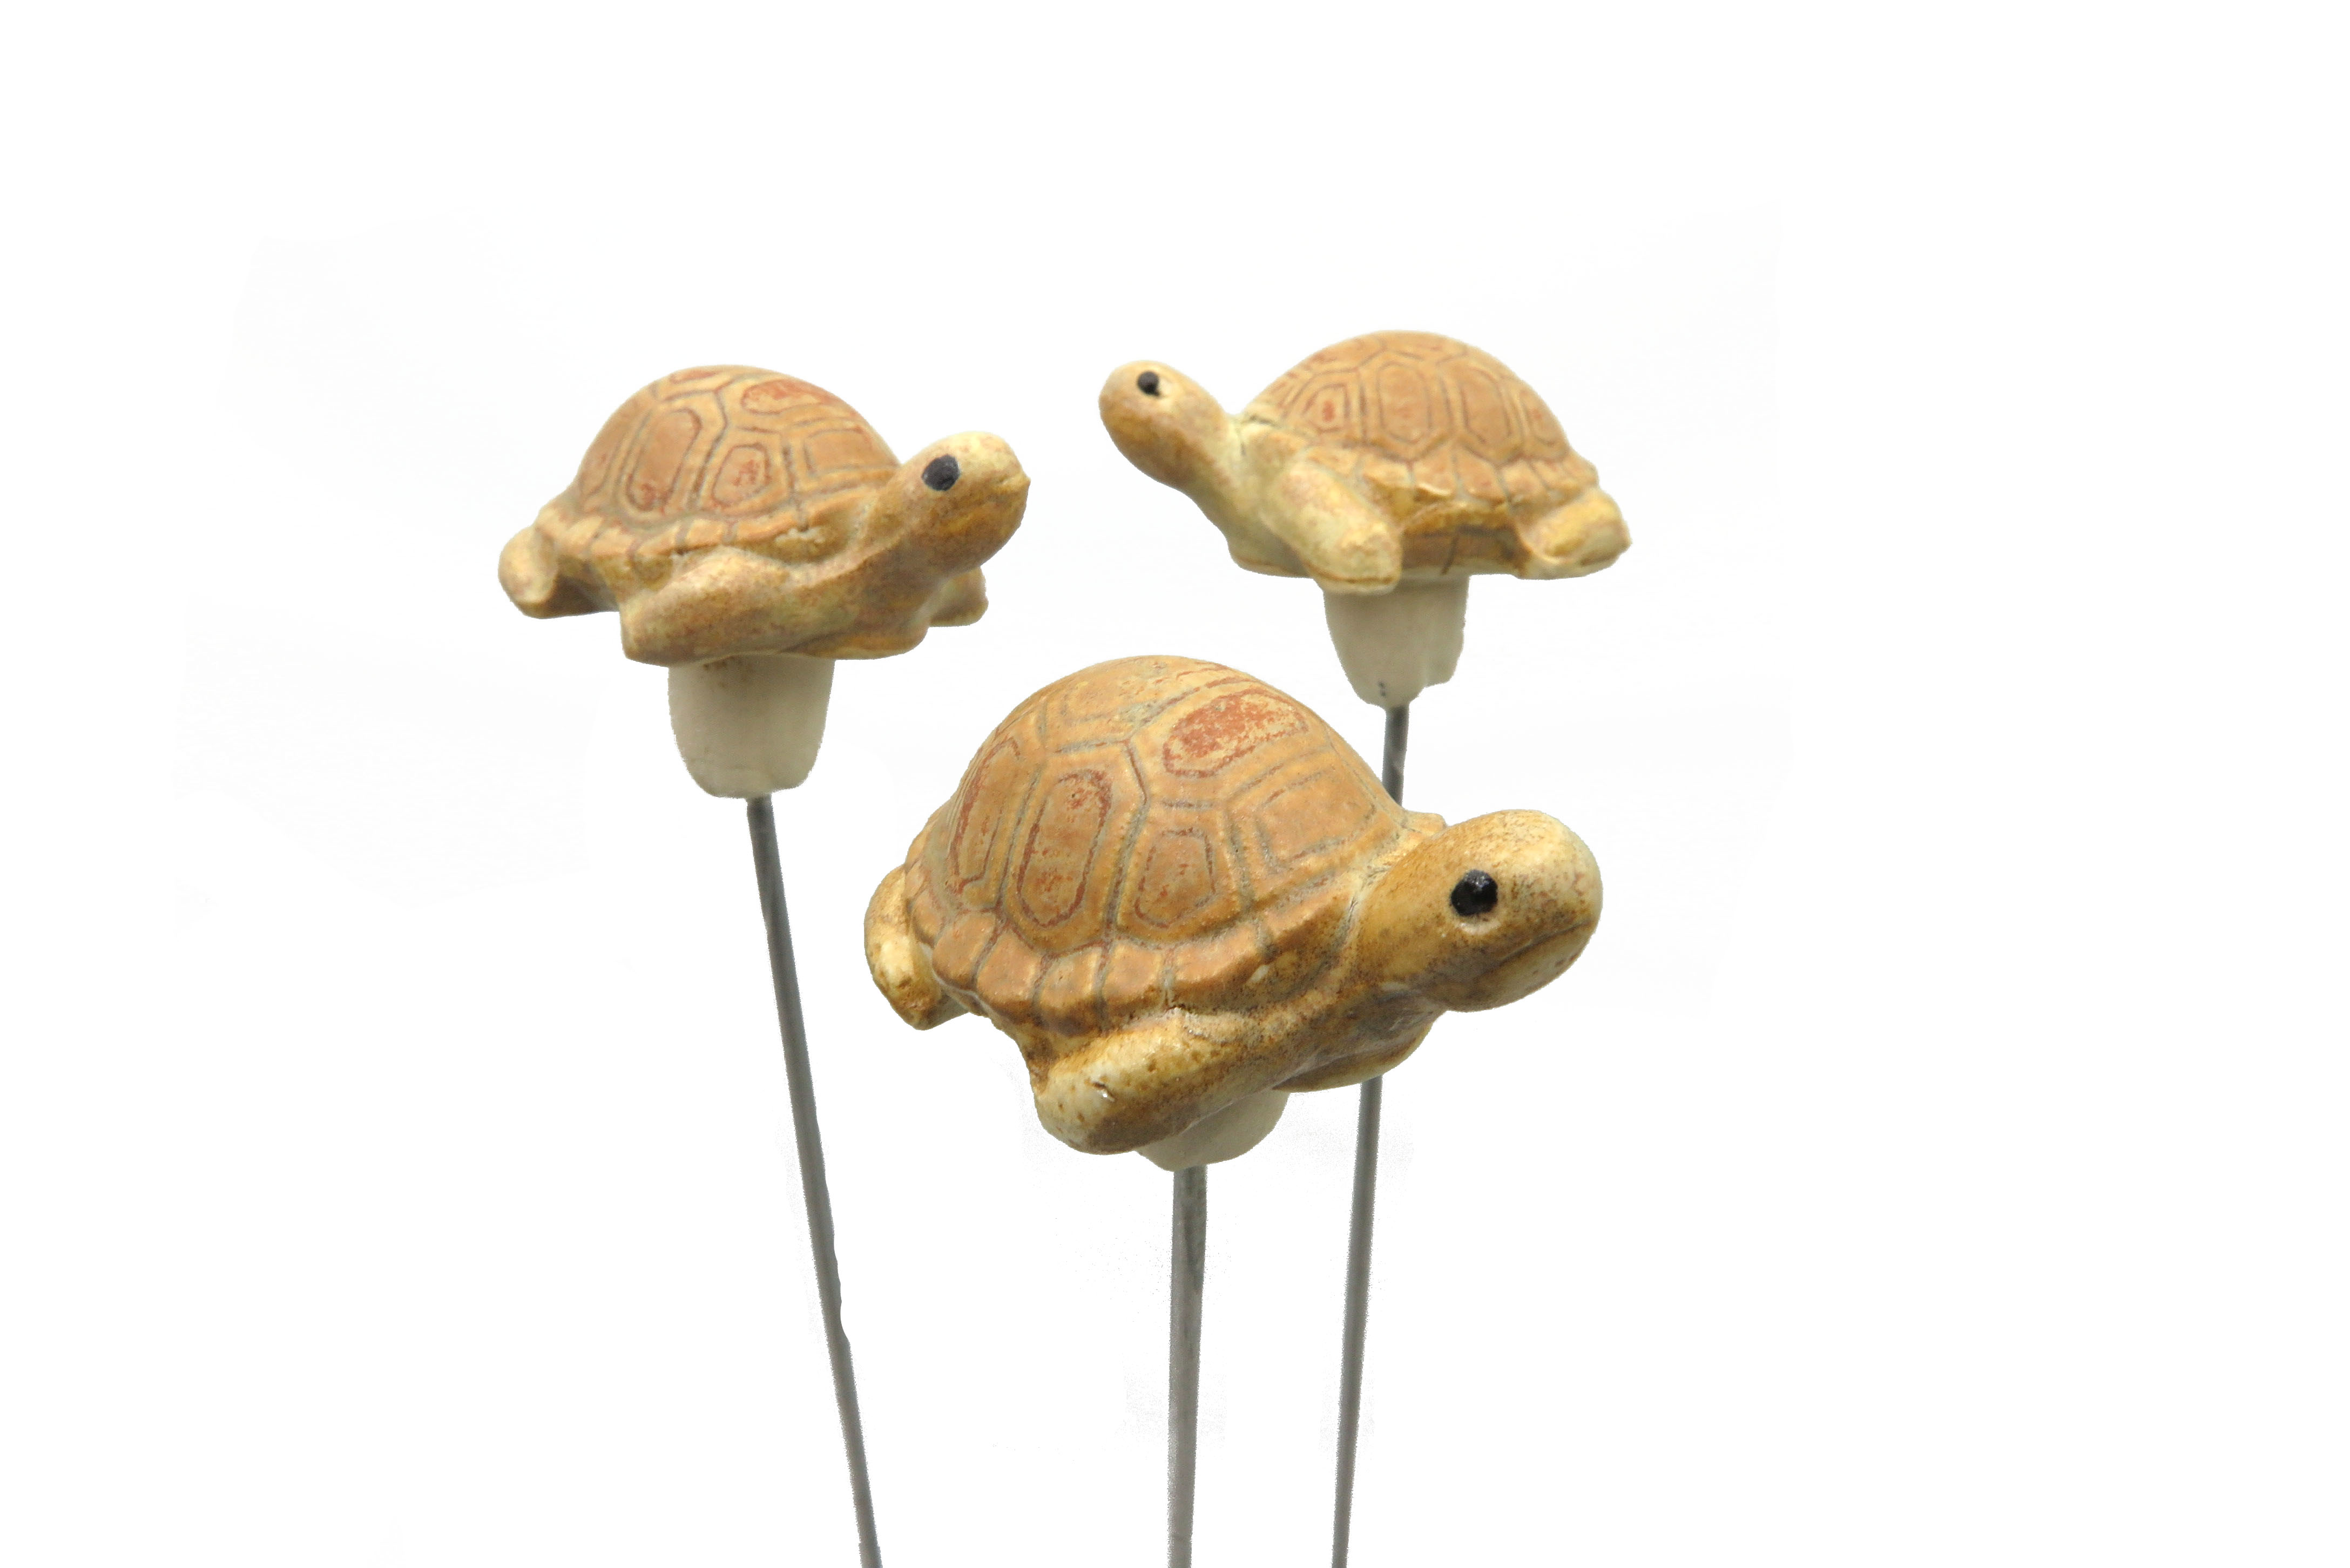 Steck-  Schildkröte sahara/ S 5cm